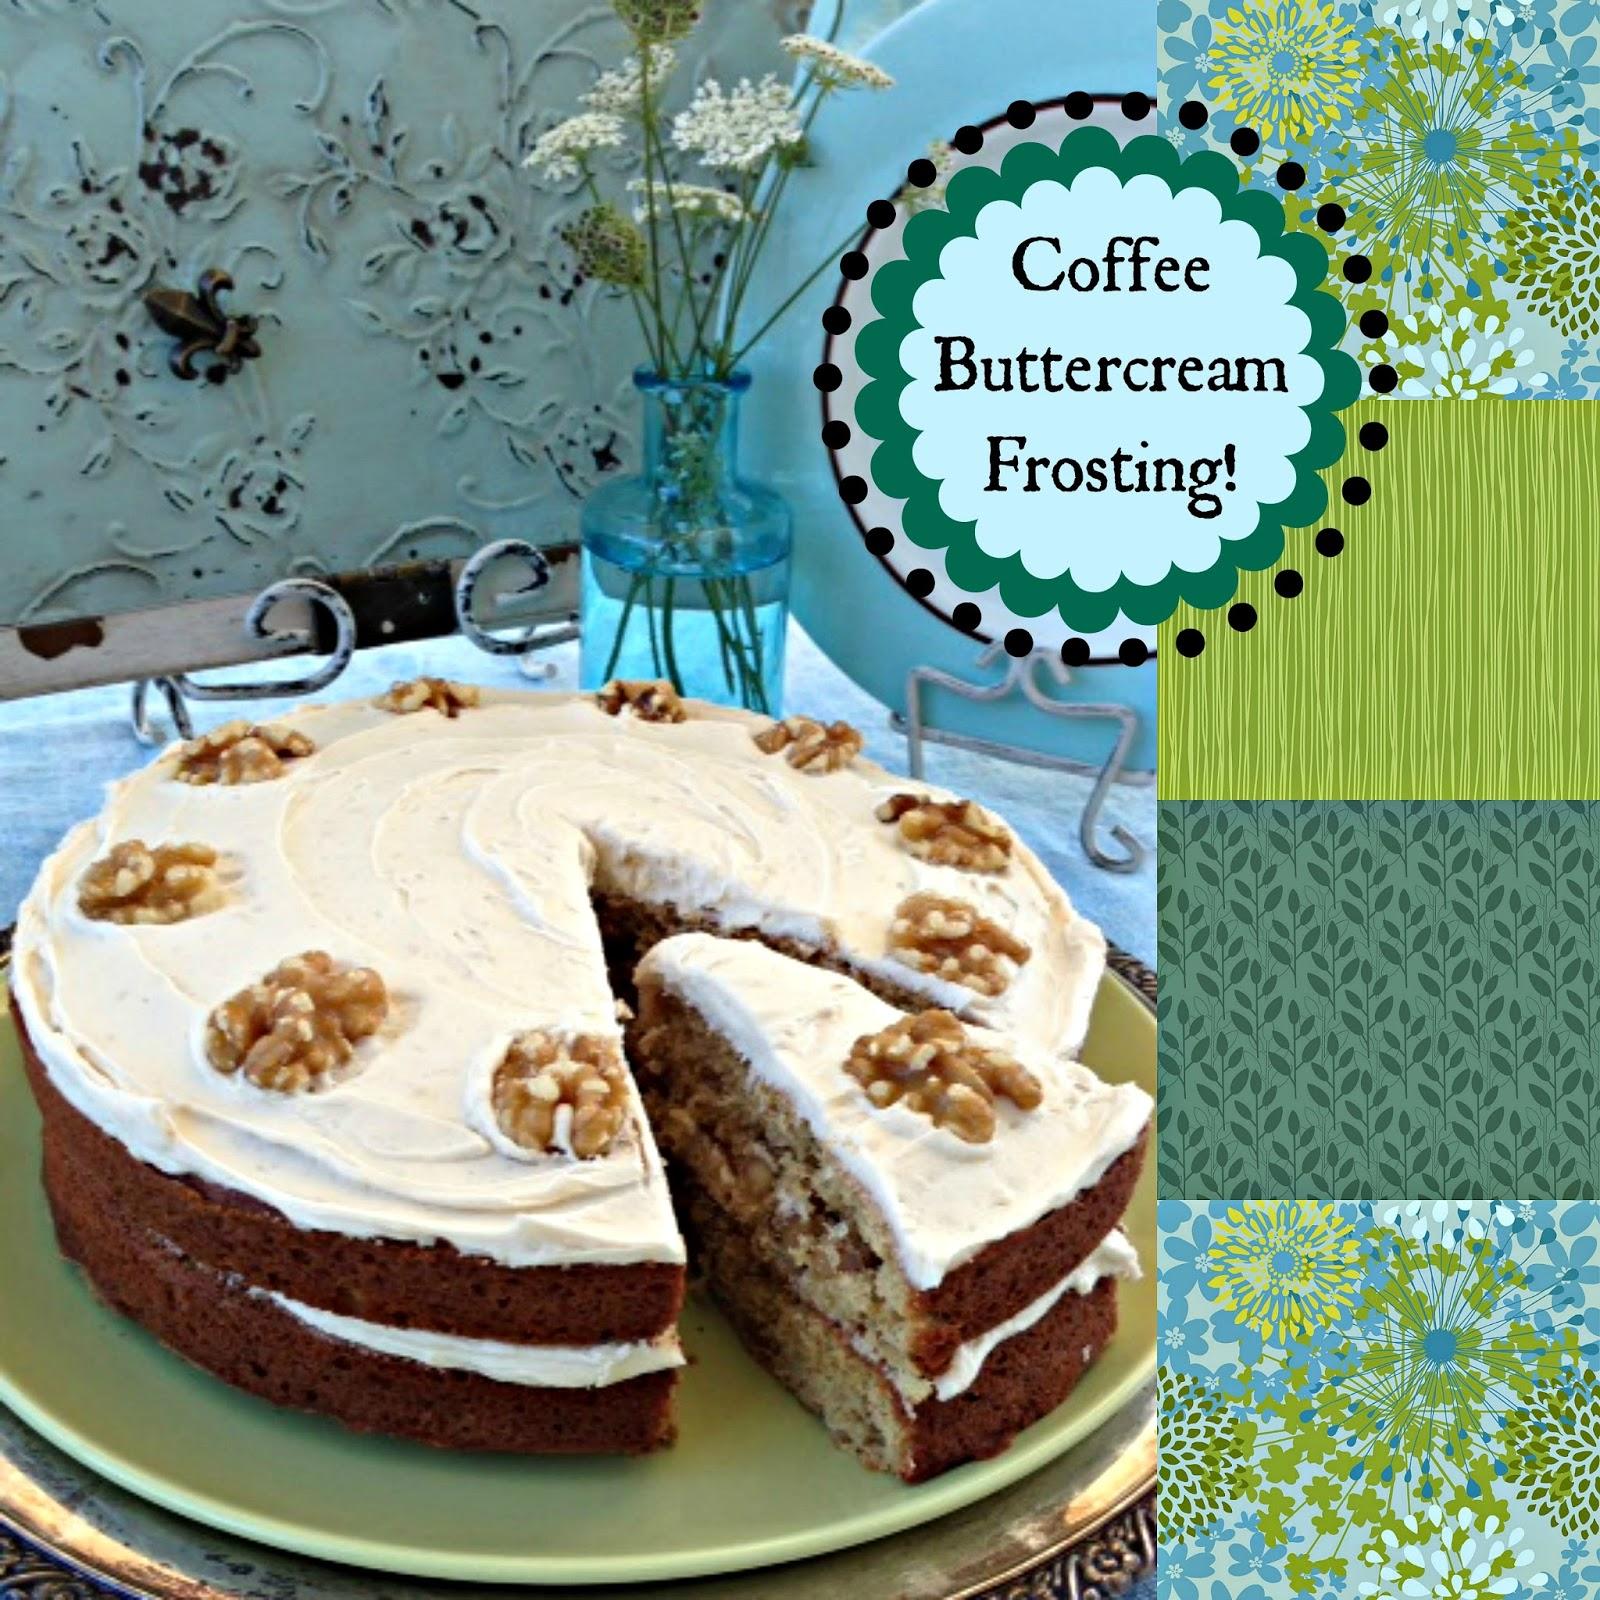 Yum Coffee Walnut Cake With Coffee Buttercream Frosting